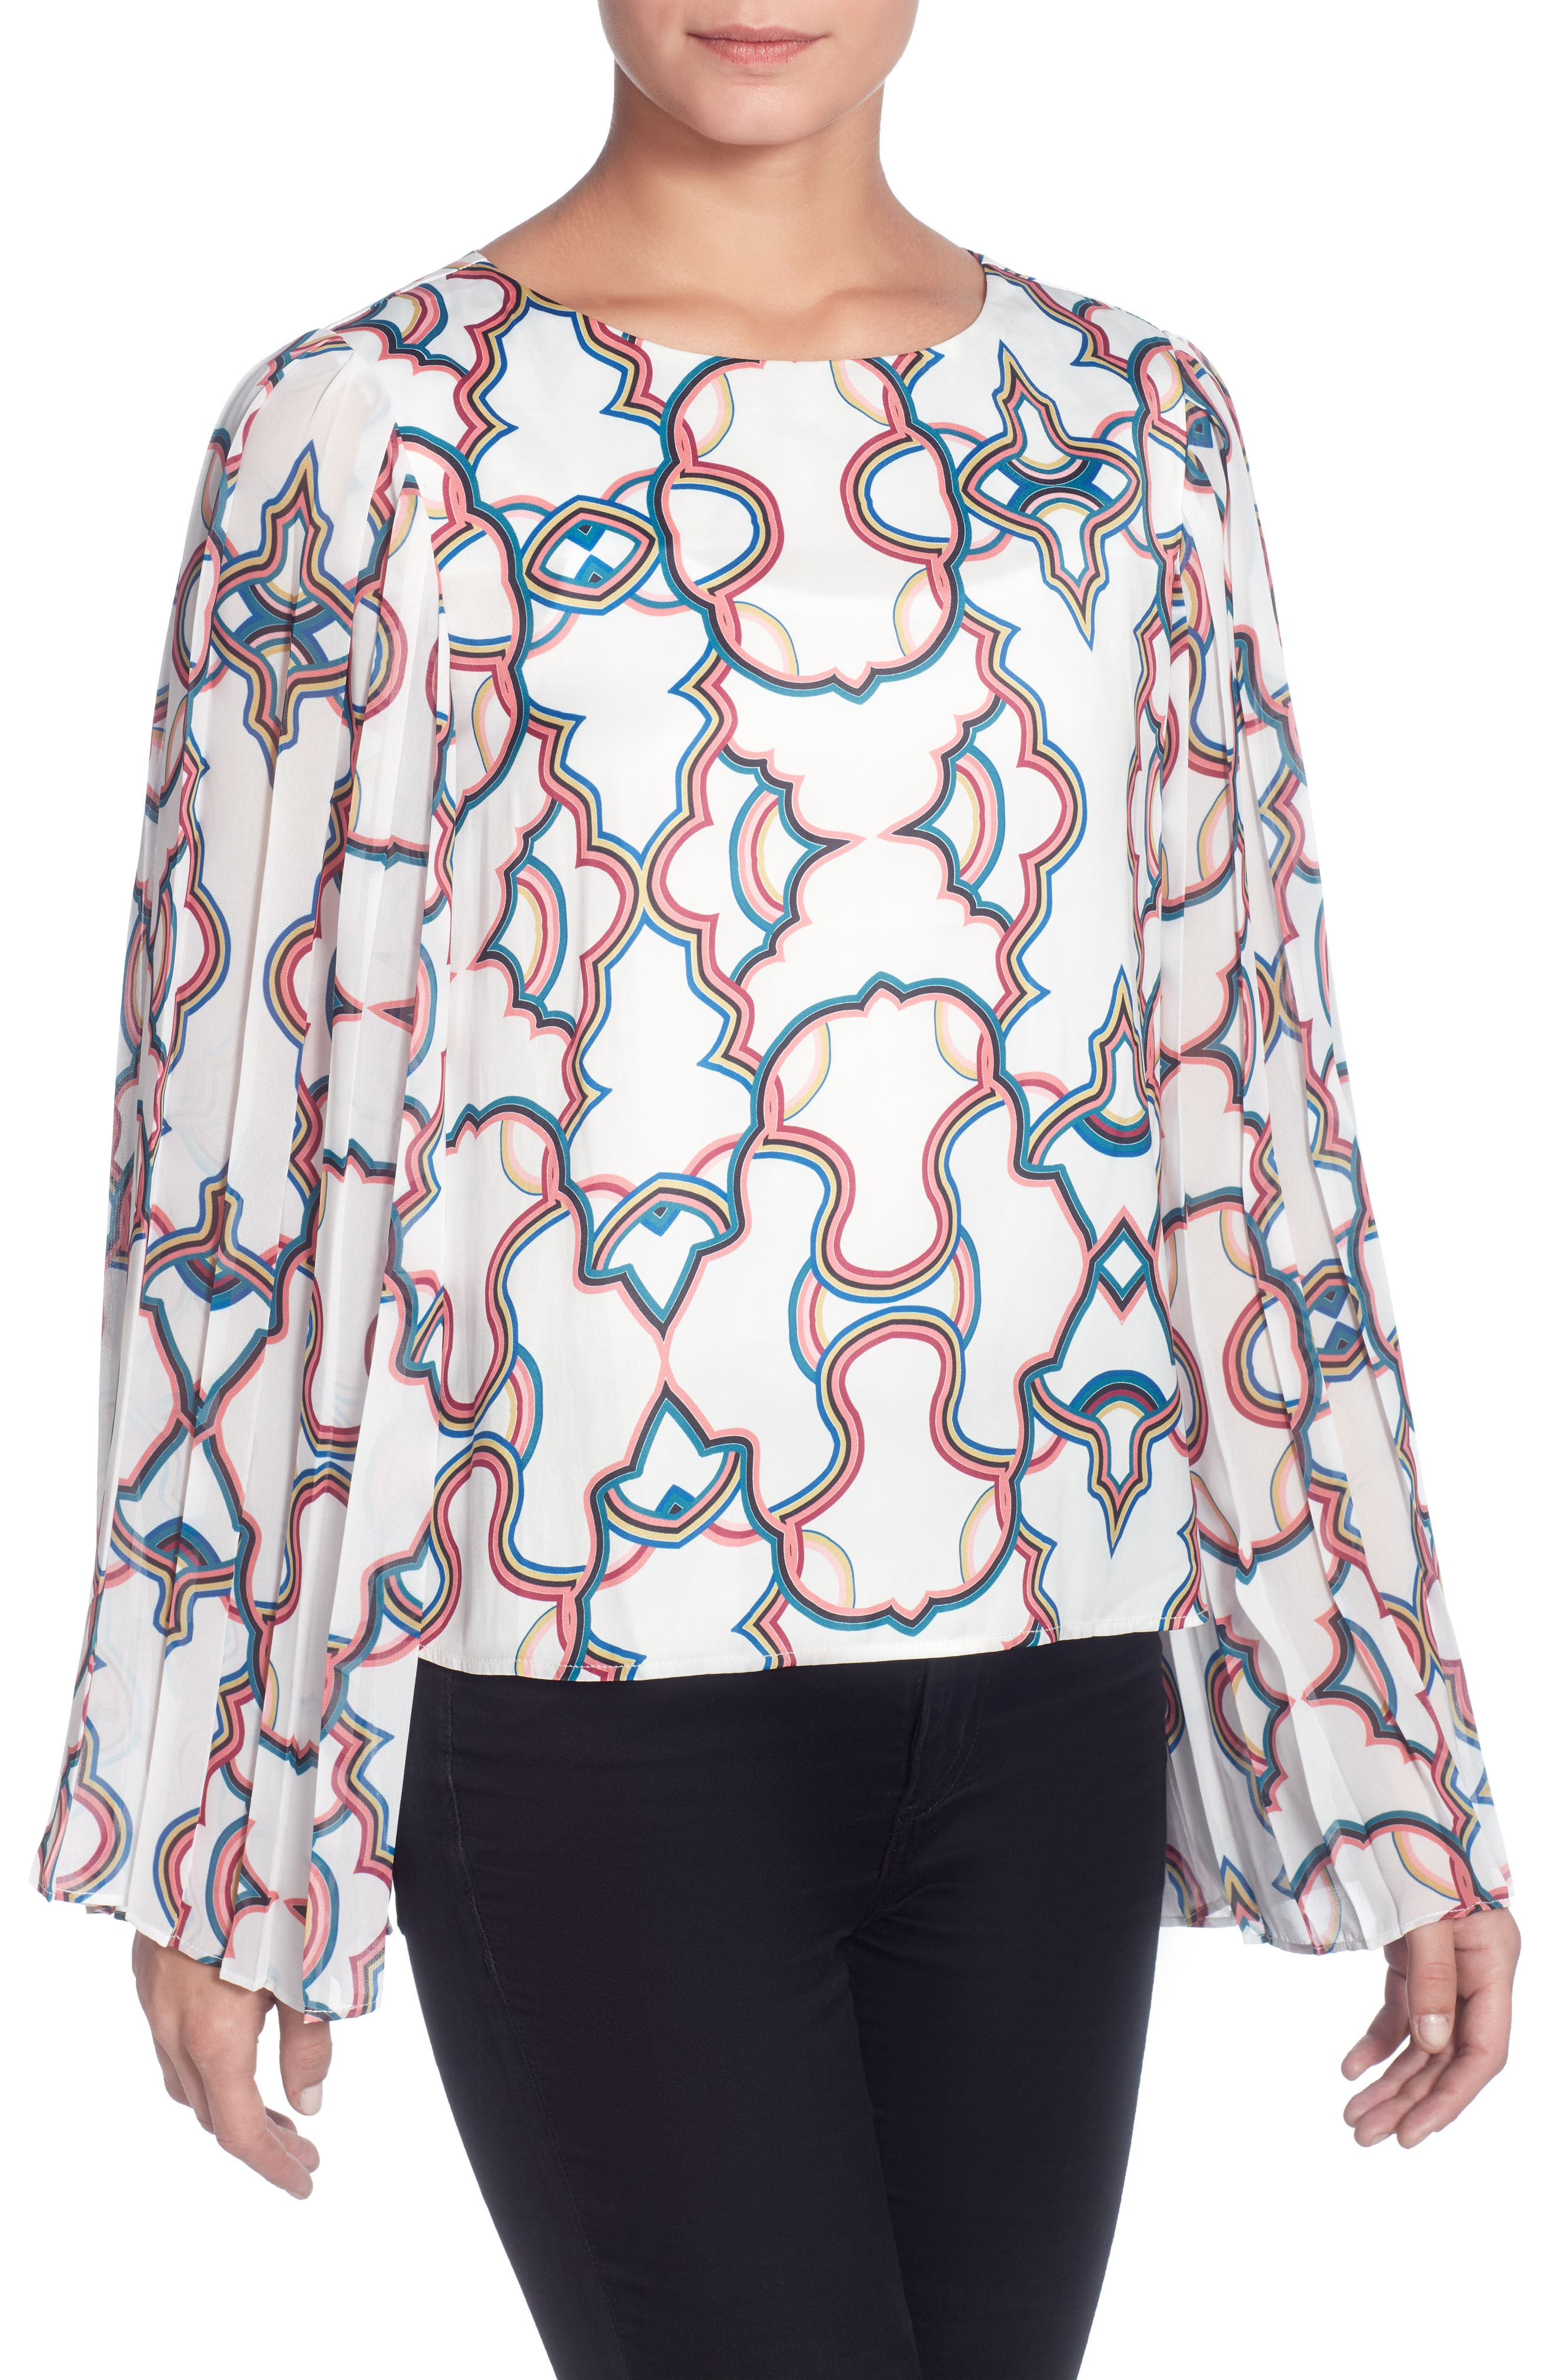 Deni Pleated Sleeve Top,                         Main,                         color, Kaleidoscope White